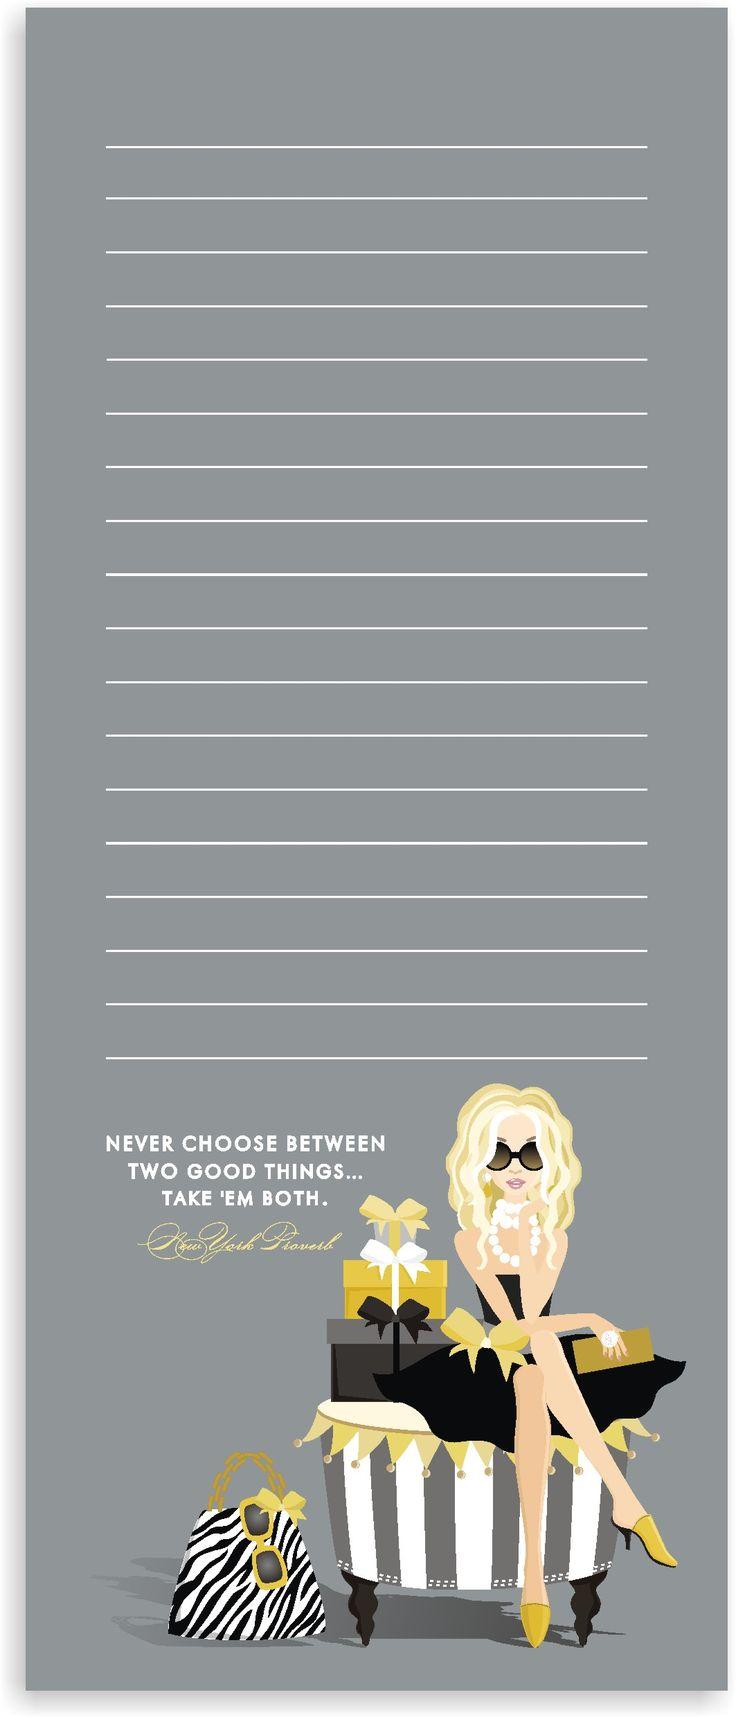 Order notepads